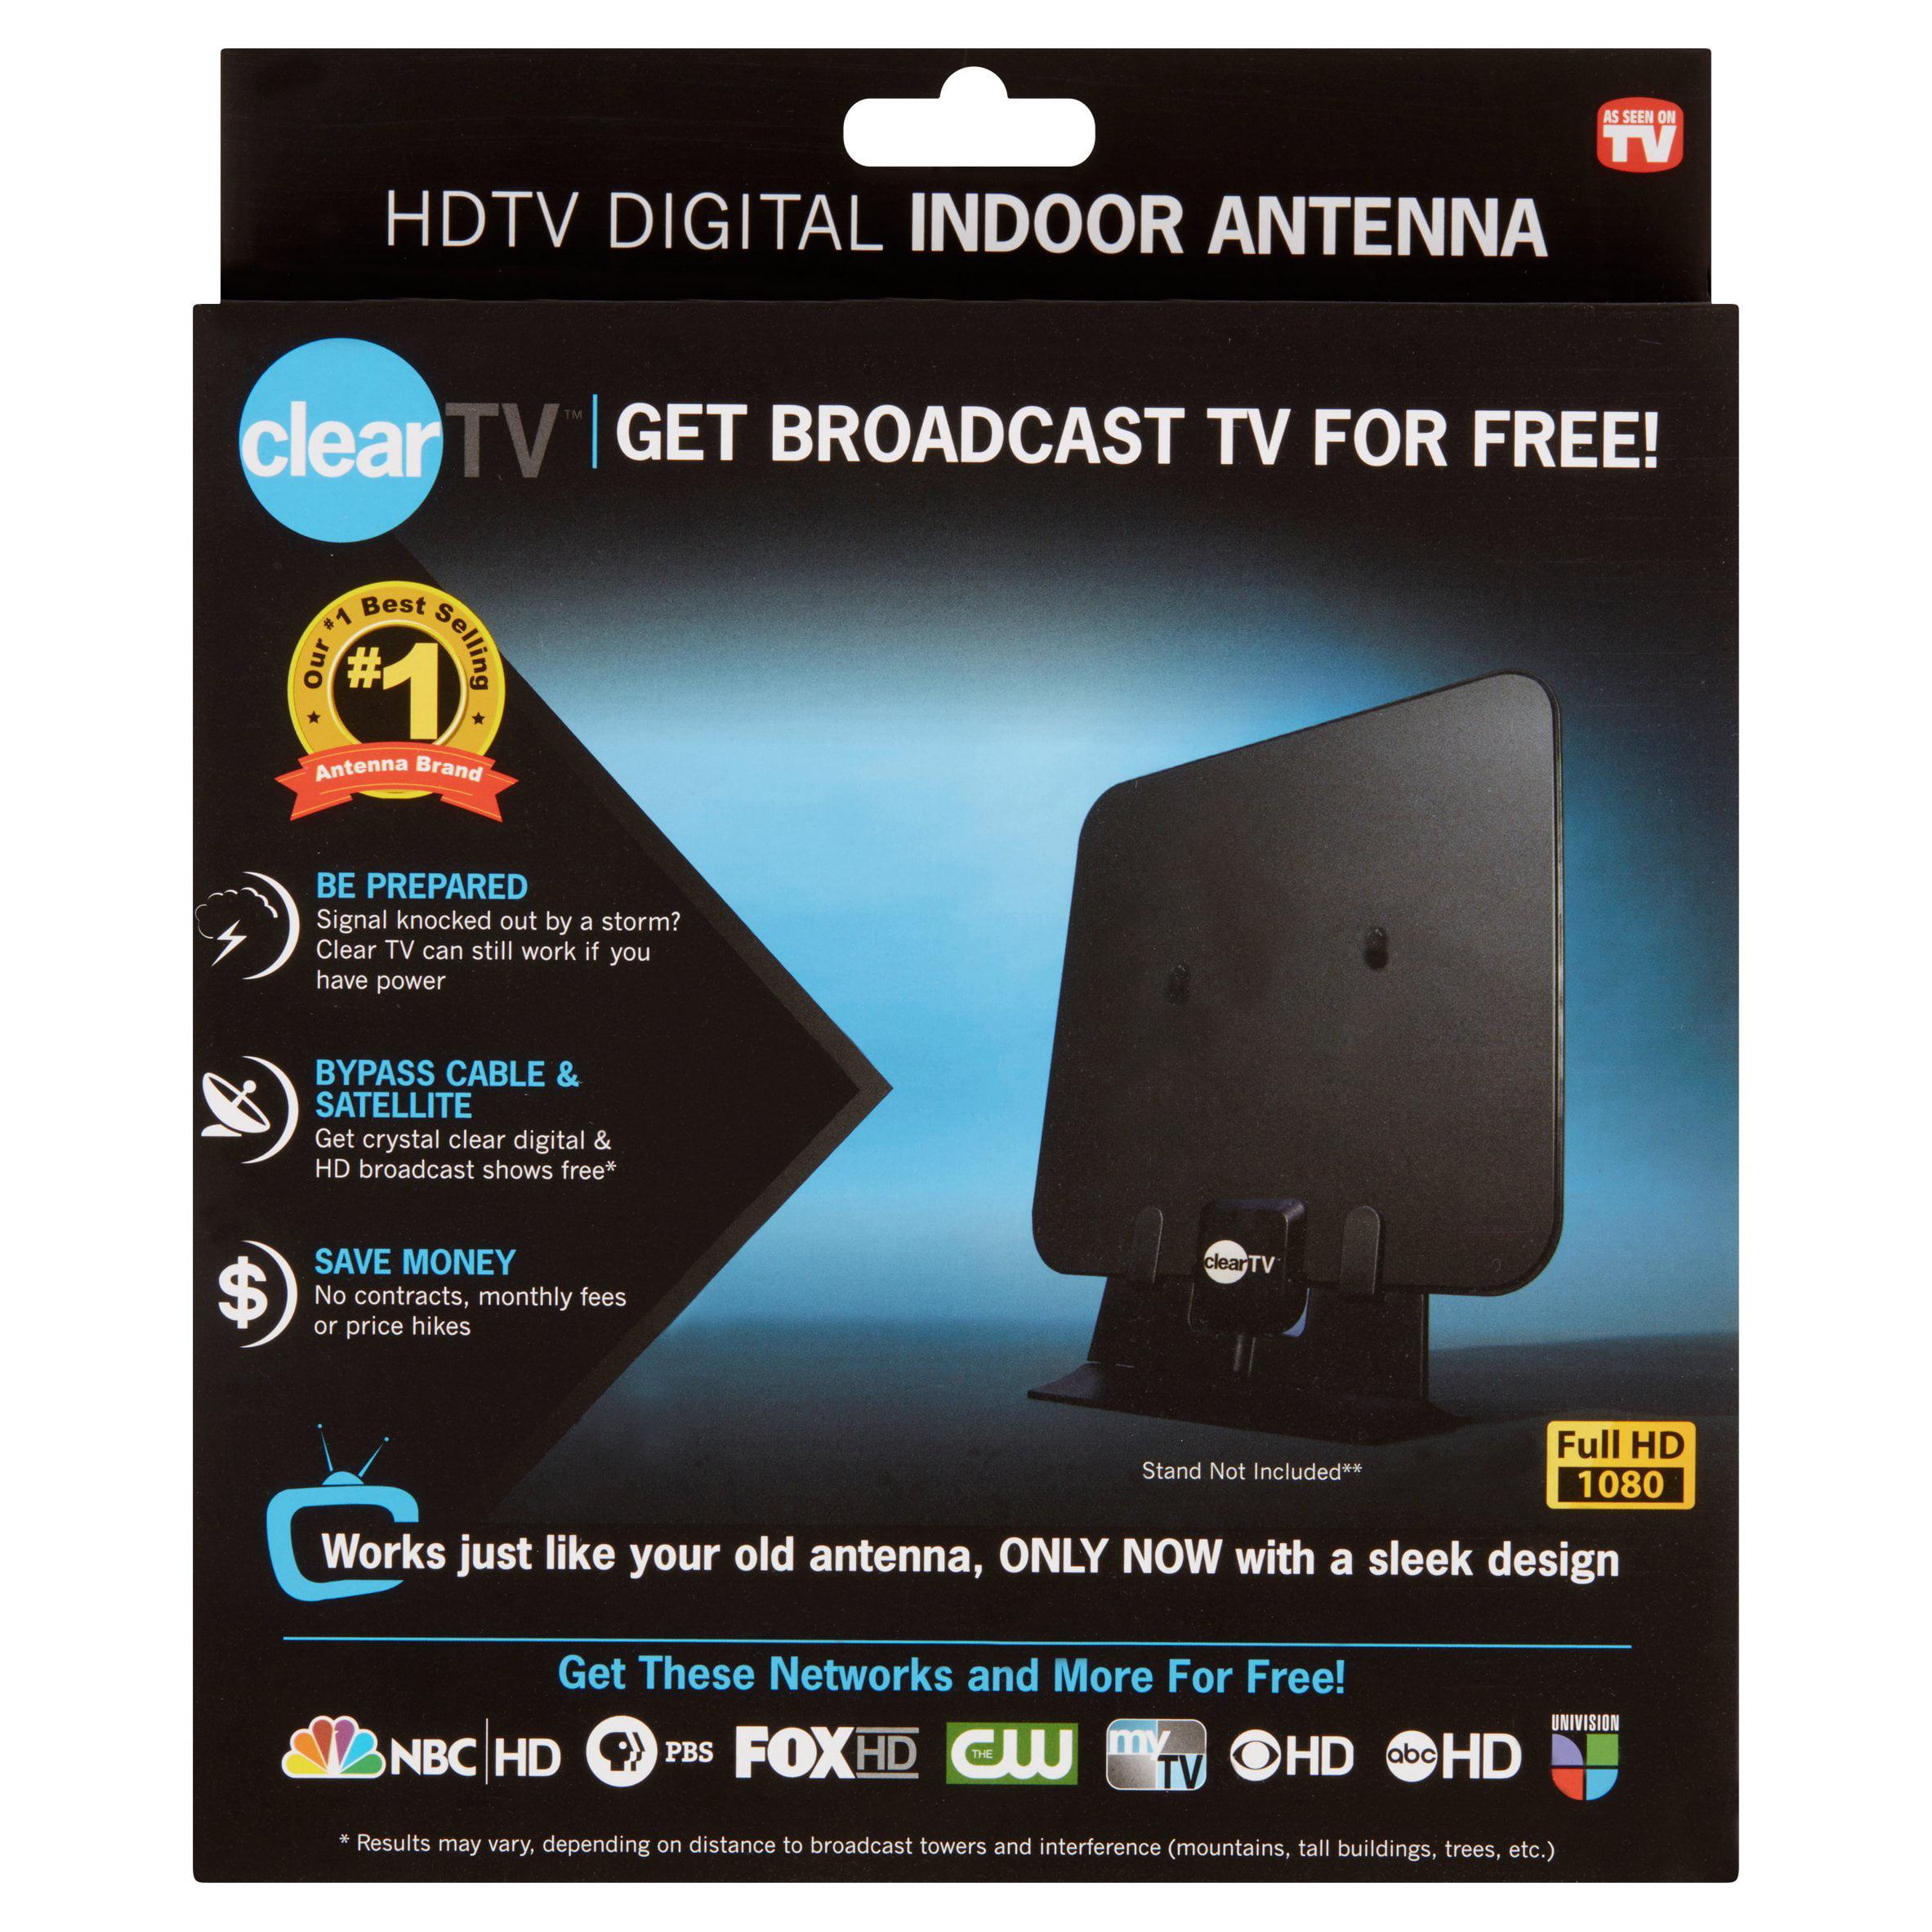 Clear Tv Hdtv Digital Indoor Antenna Broadcast Network Tv In Hd